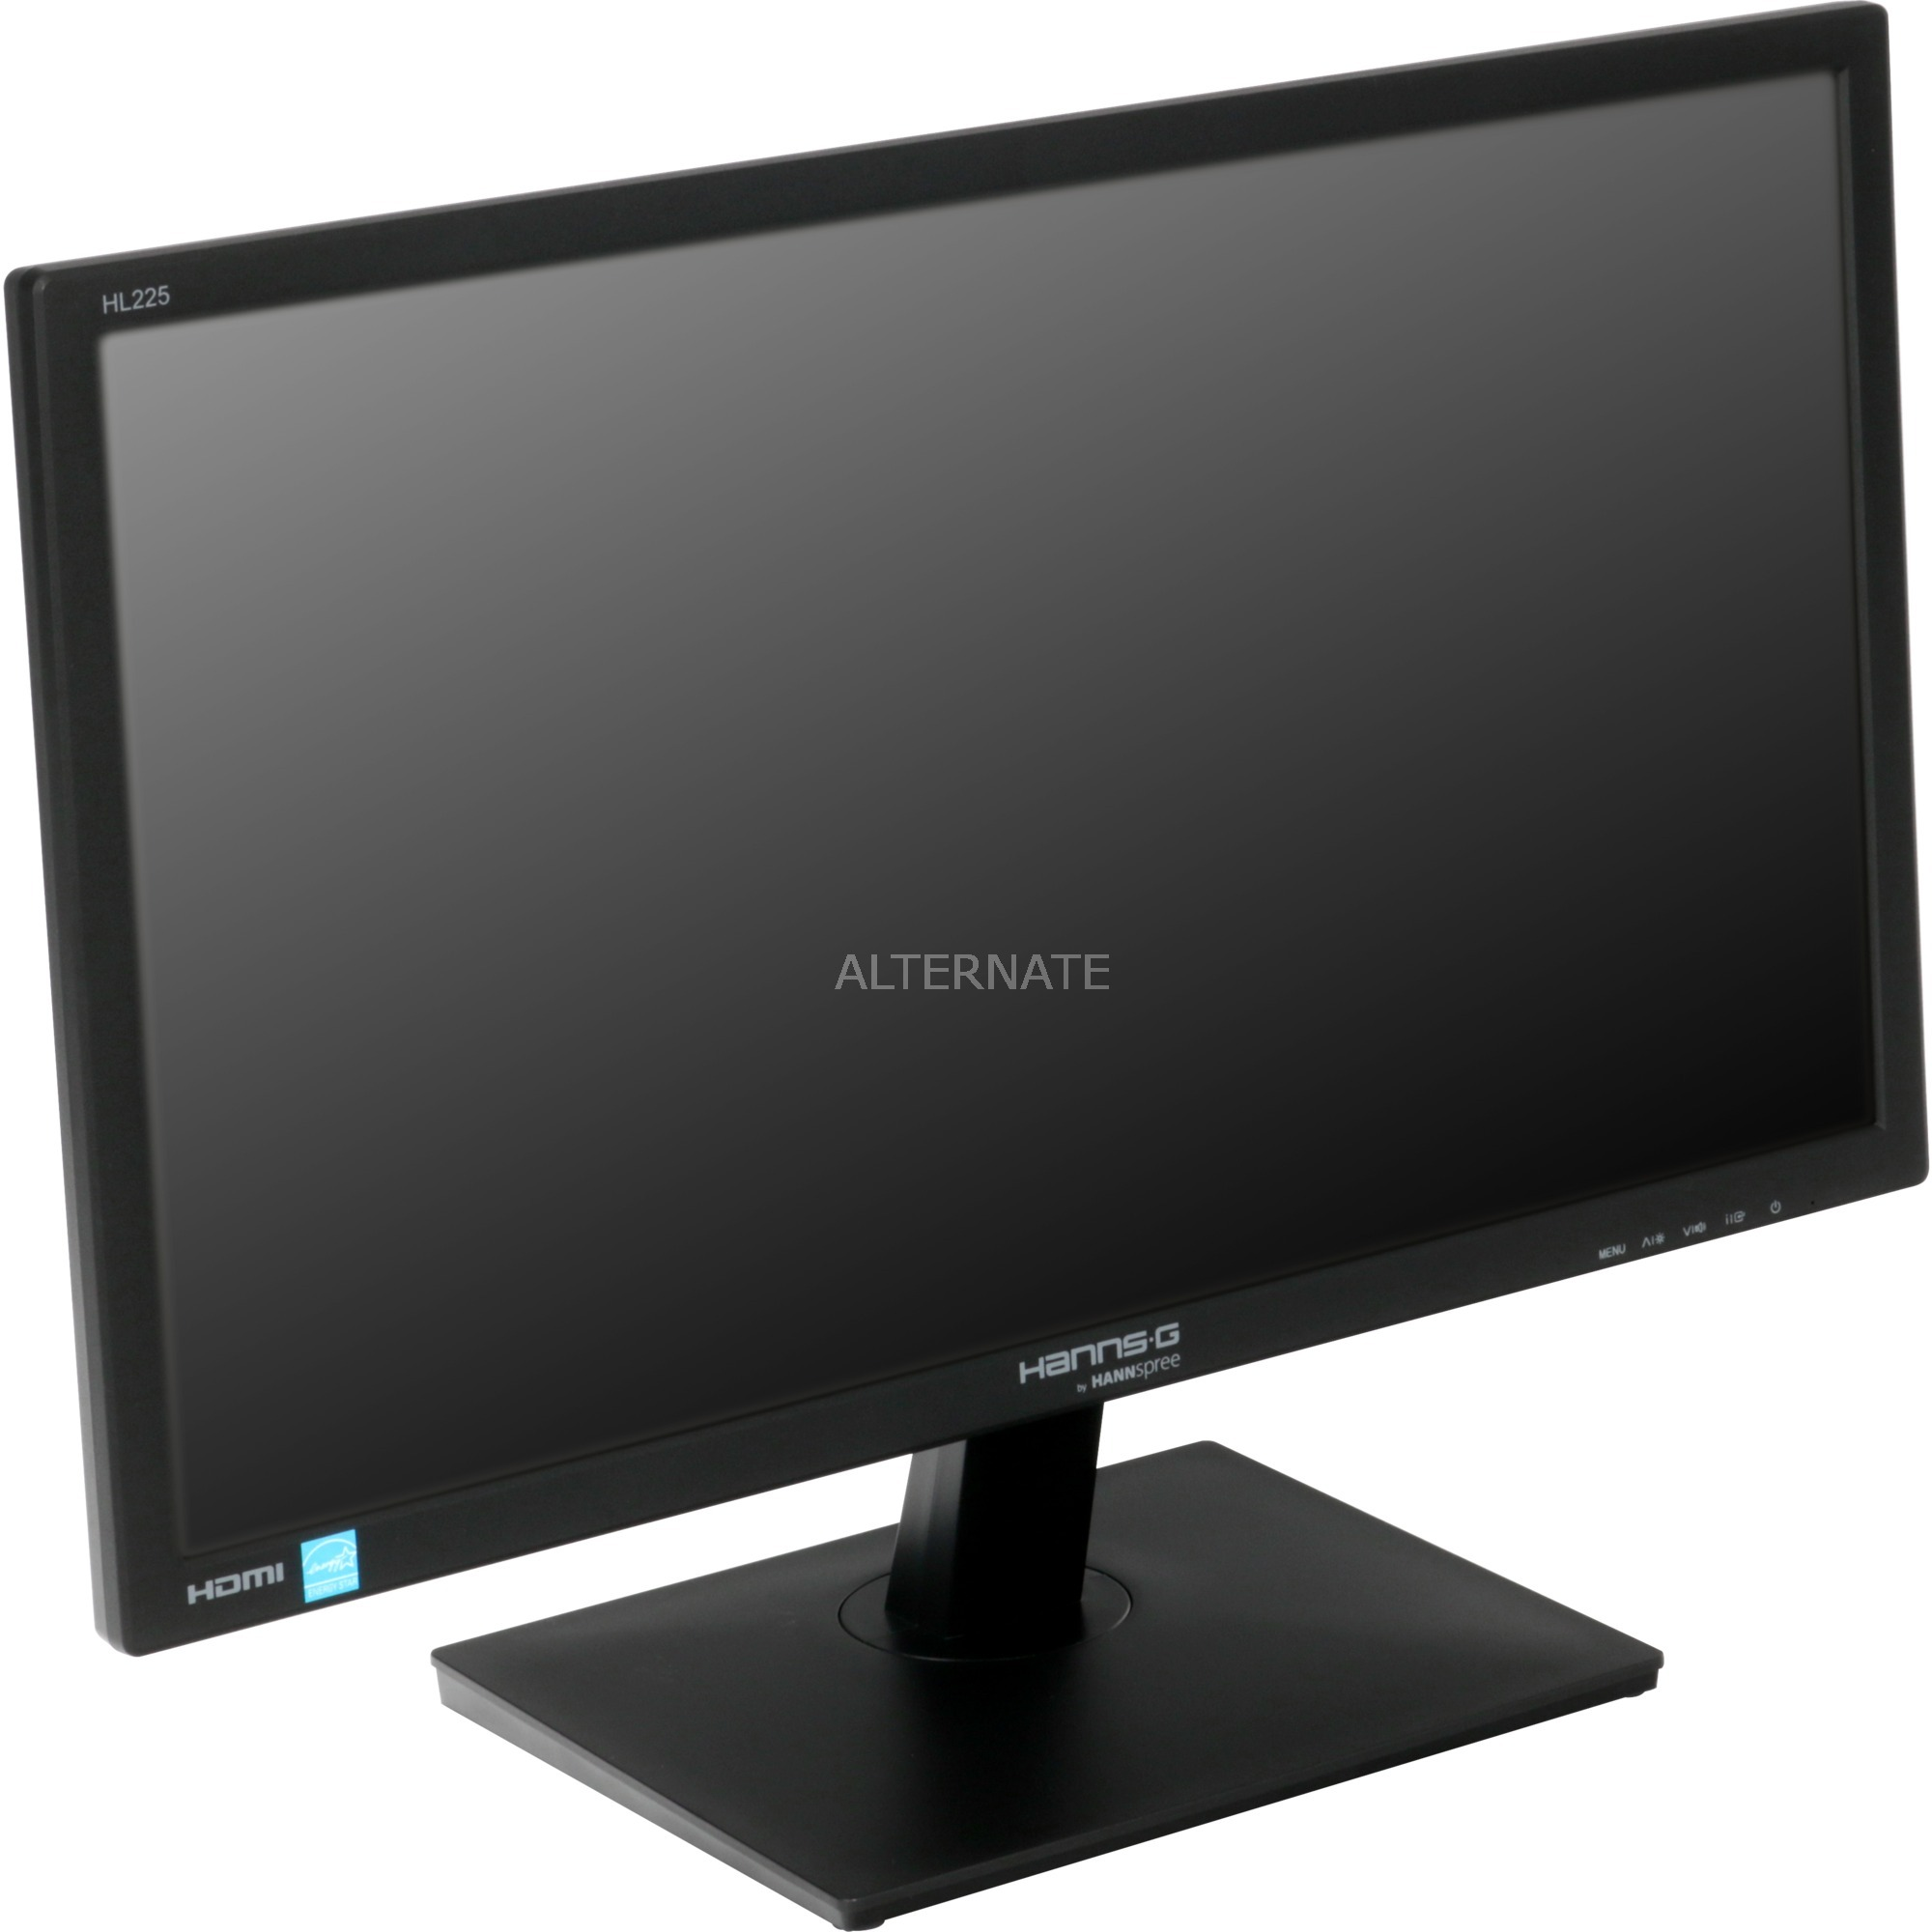 "Hanns.G HL 225 HPB pantalla para PC 54,6 cm (21.5"") Full HD LCD Plana Negro, Monitor LED"